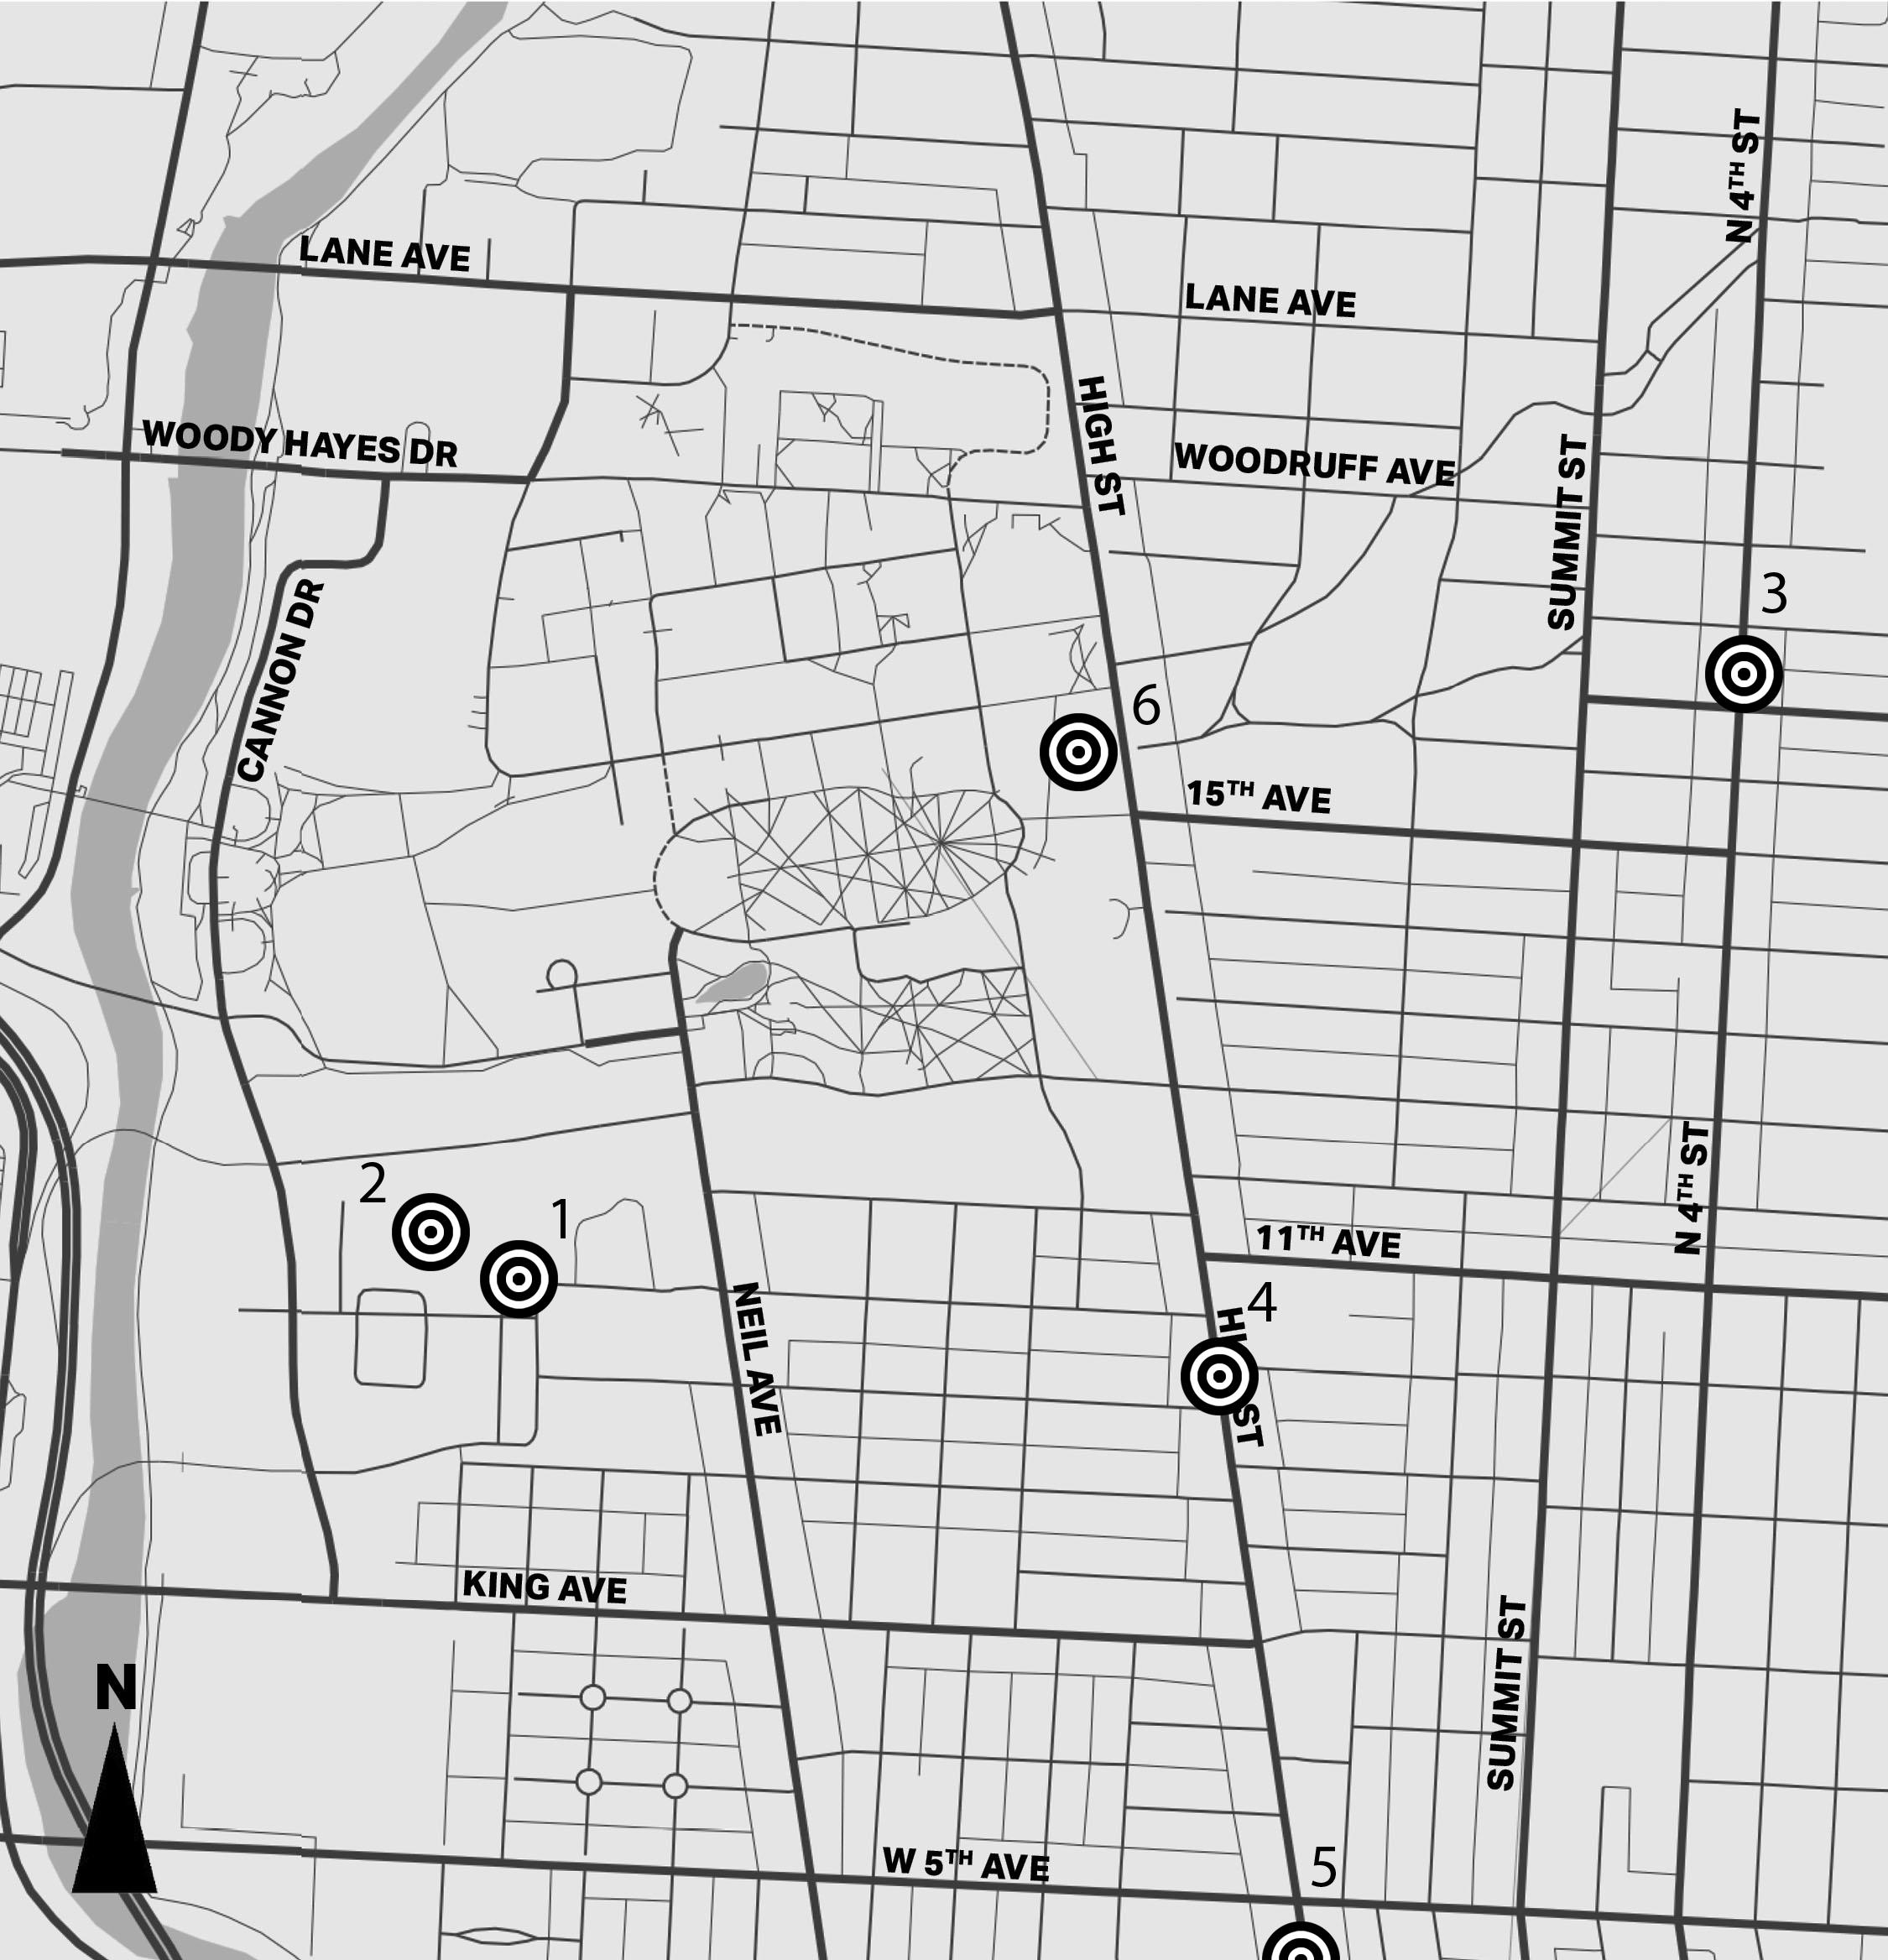 Campus area crime map: Nov. 30